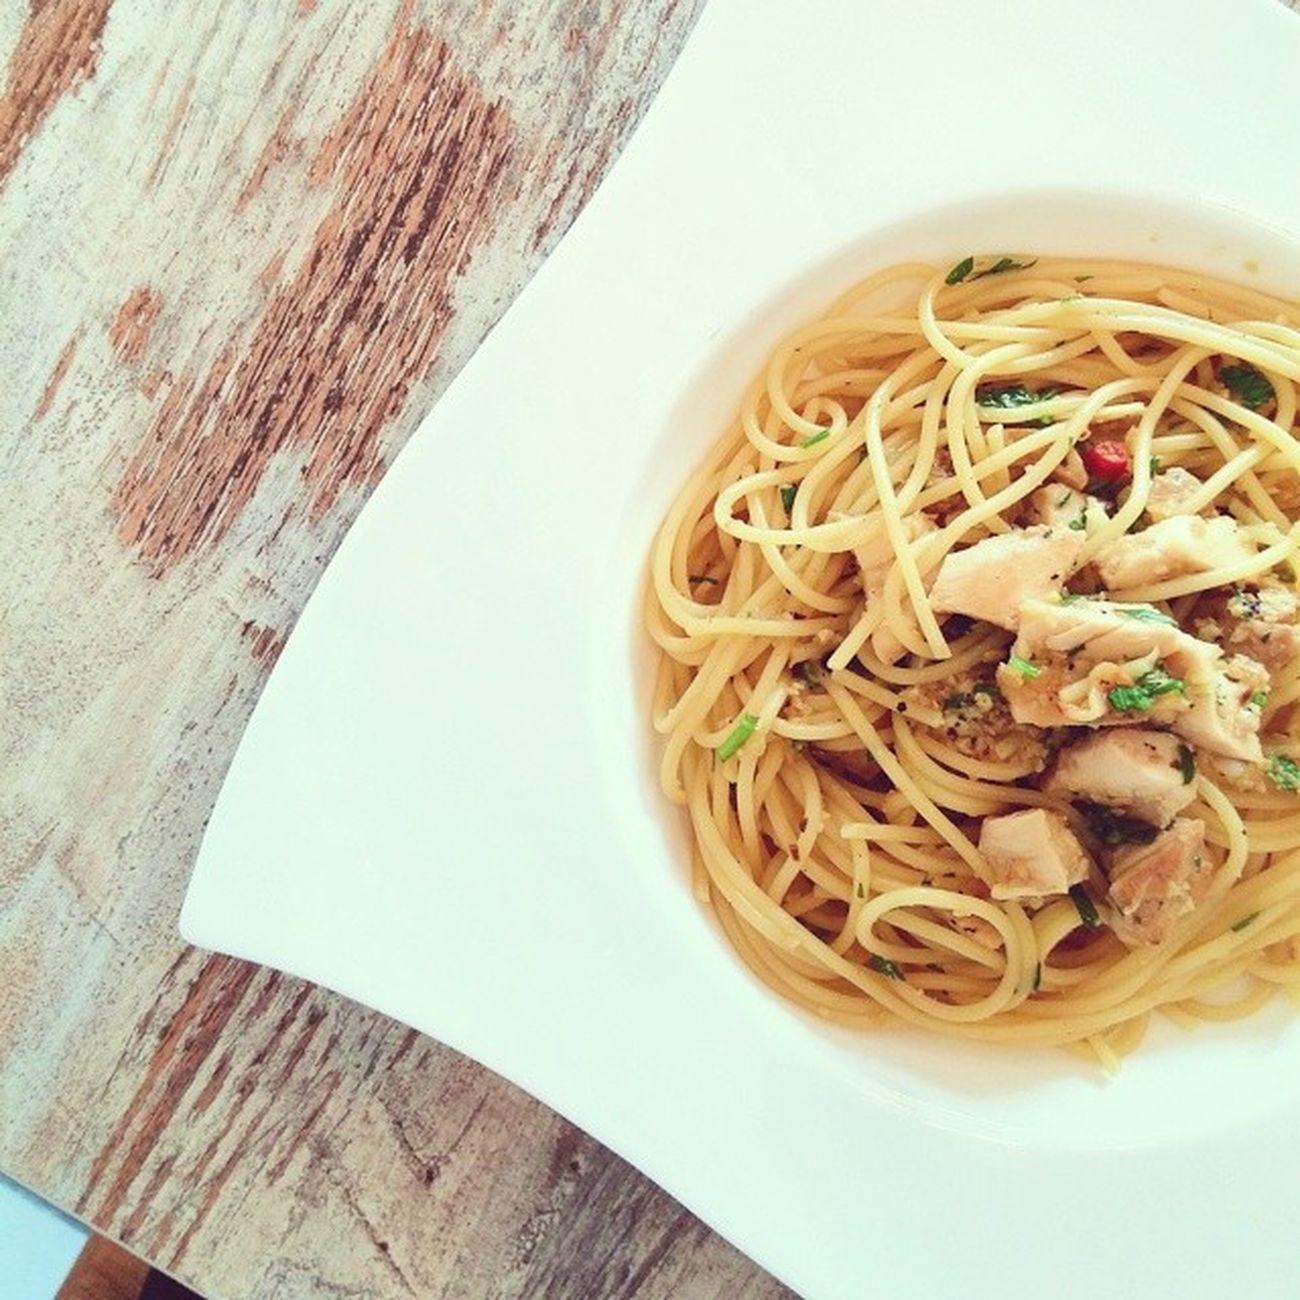 Chicken Olio. Got that smoky chicken taste but quite nice. Burpple Pandelightsbistro Bukitmerahcentral Hdbcafe cafesg